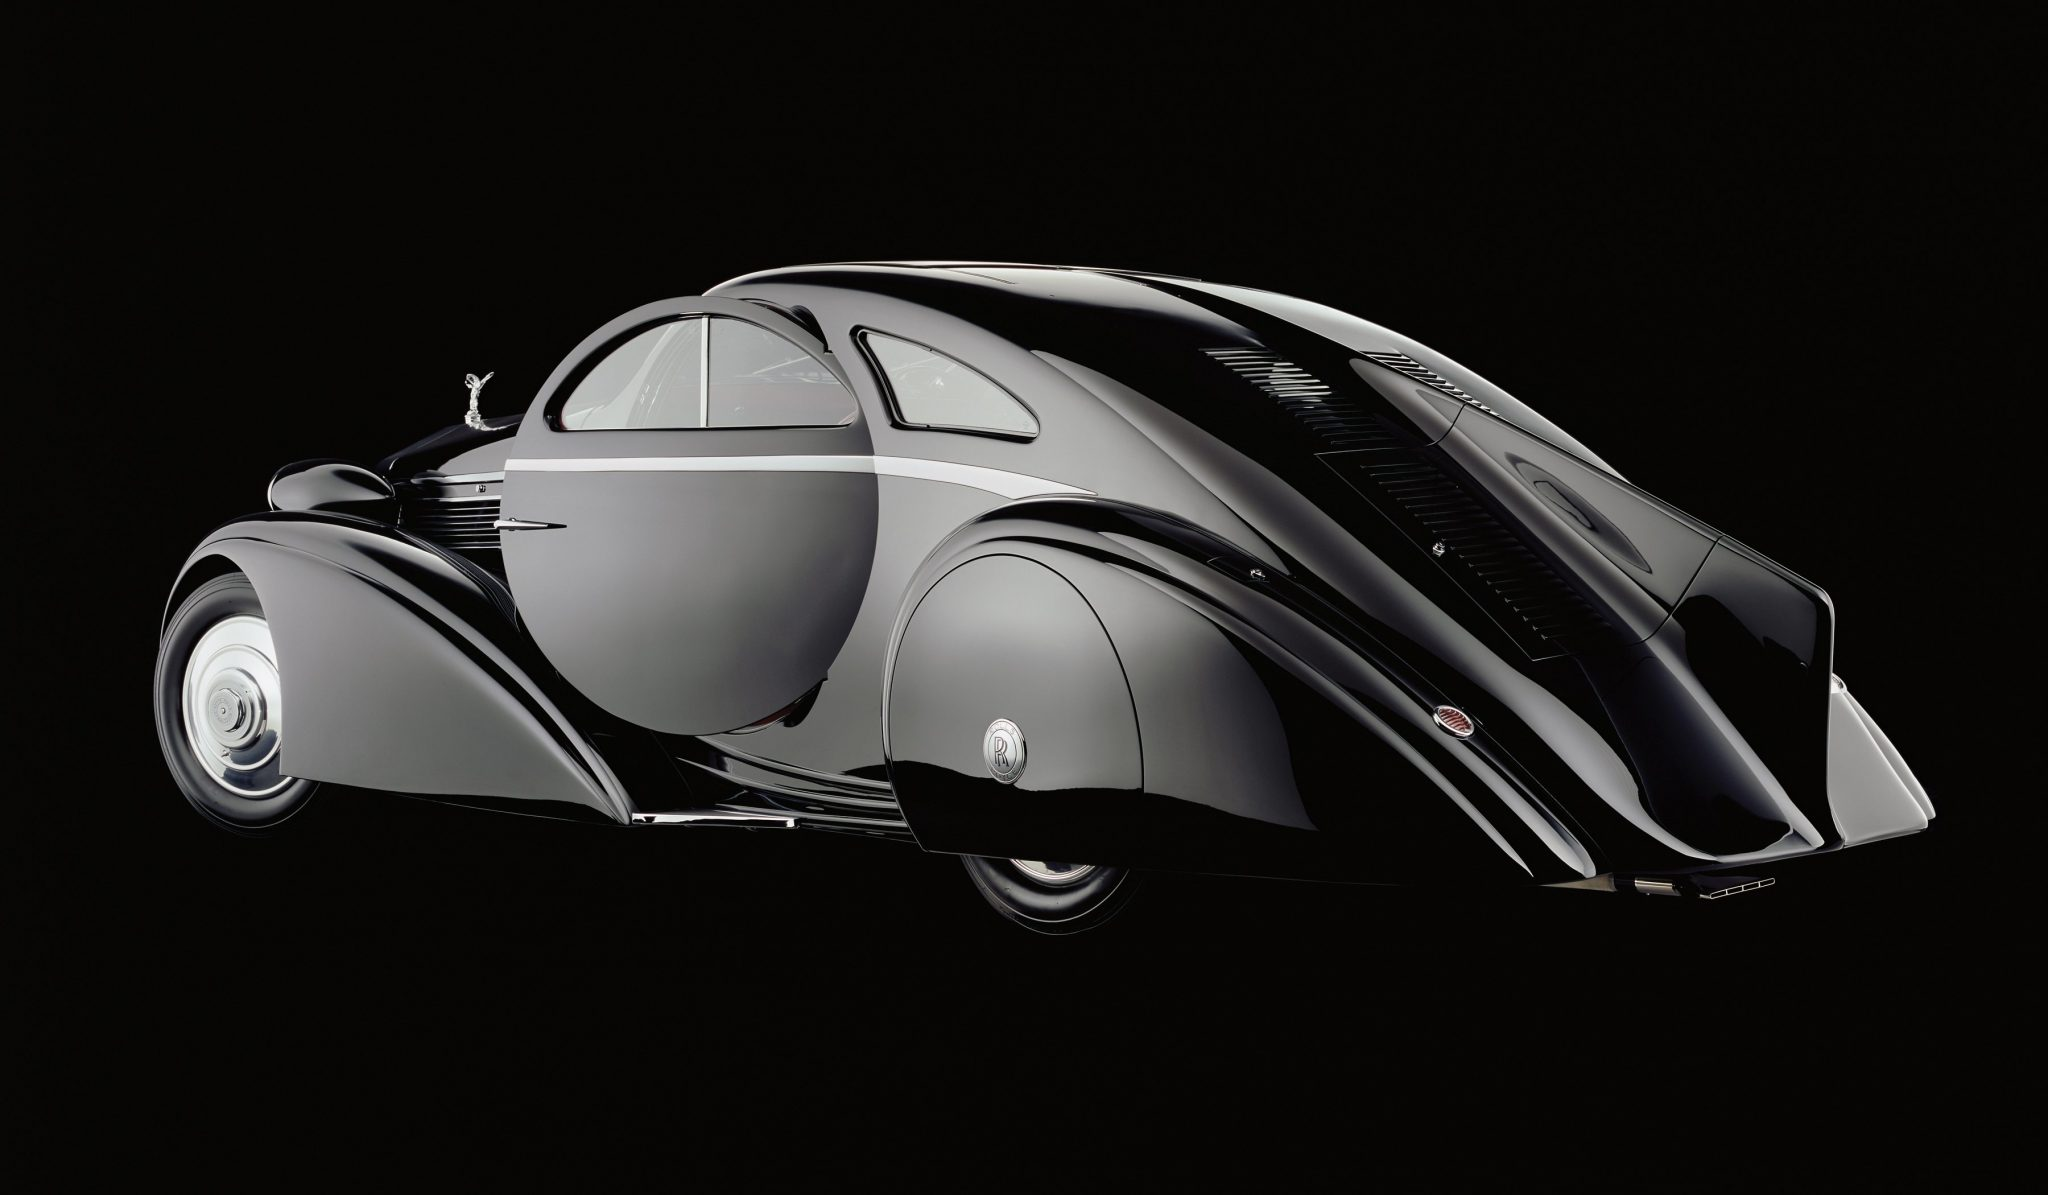 Phantom 1 Jonckheere Coupe Rear Side View